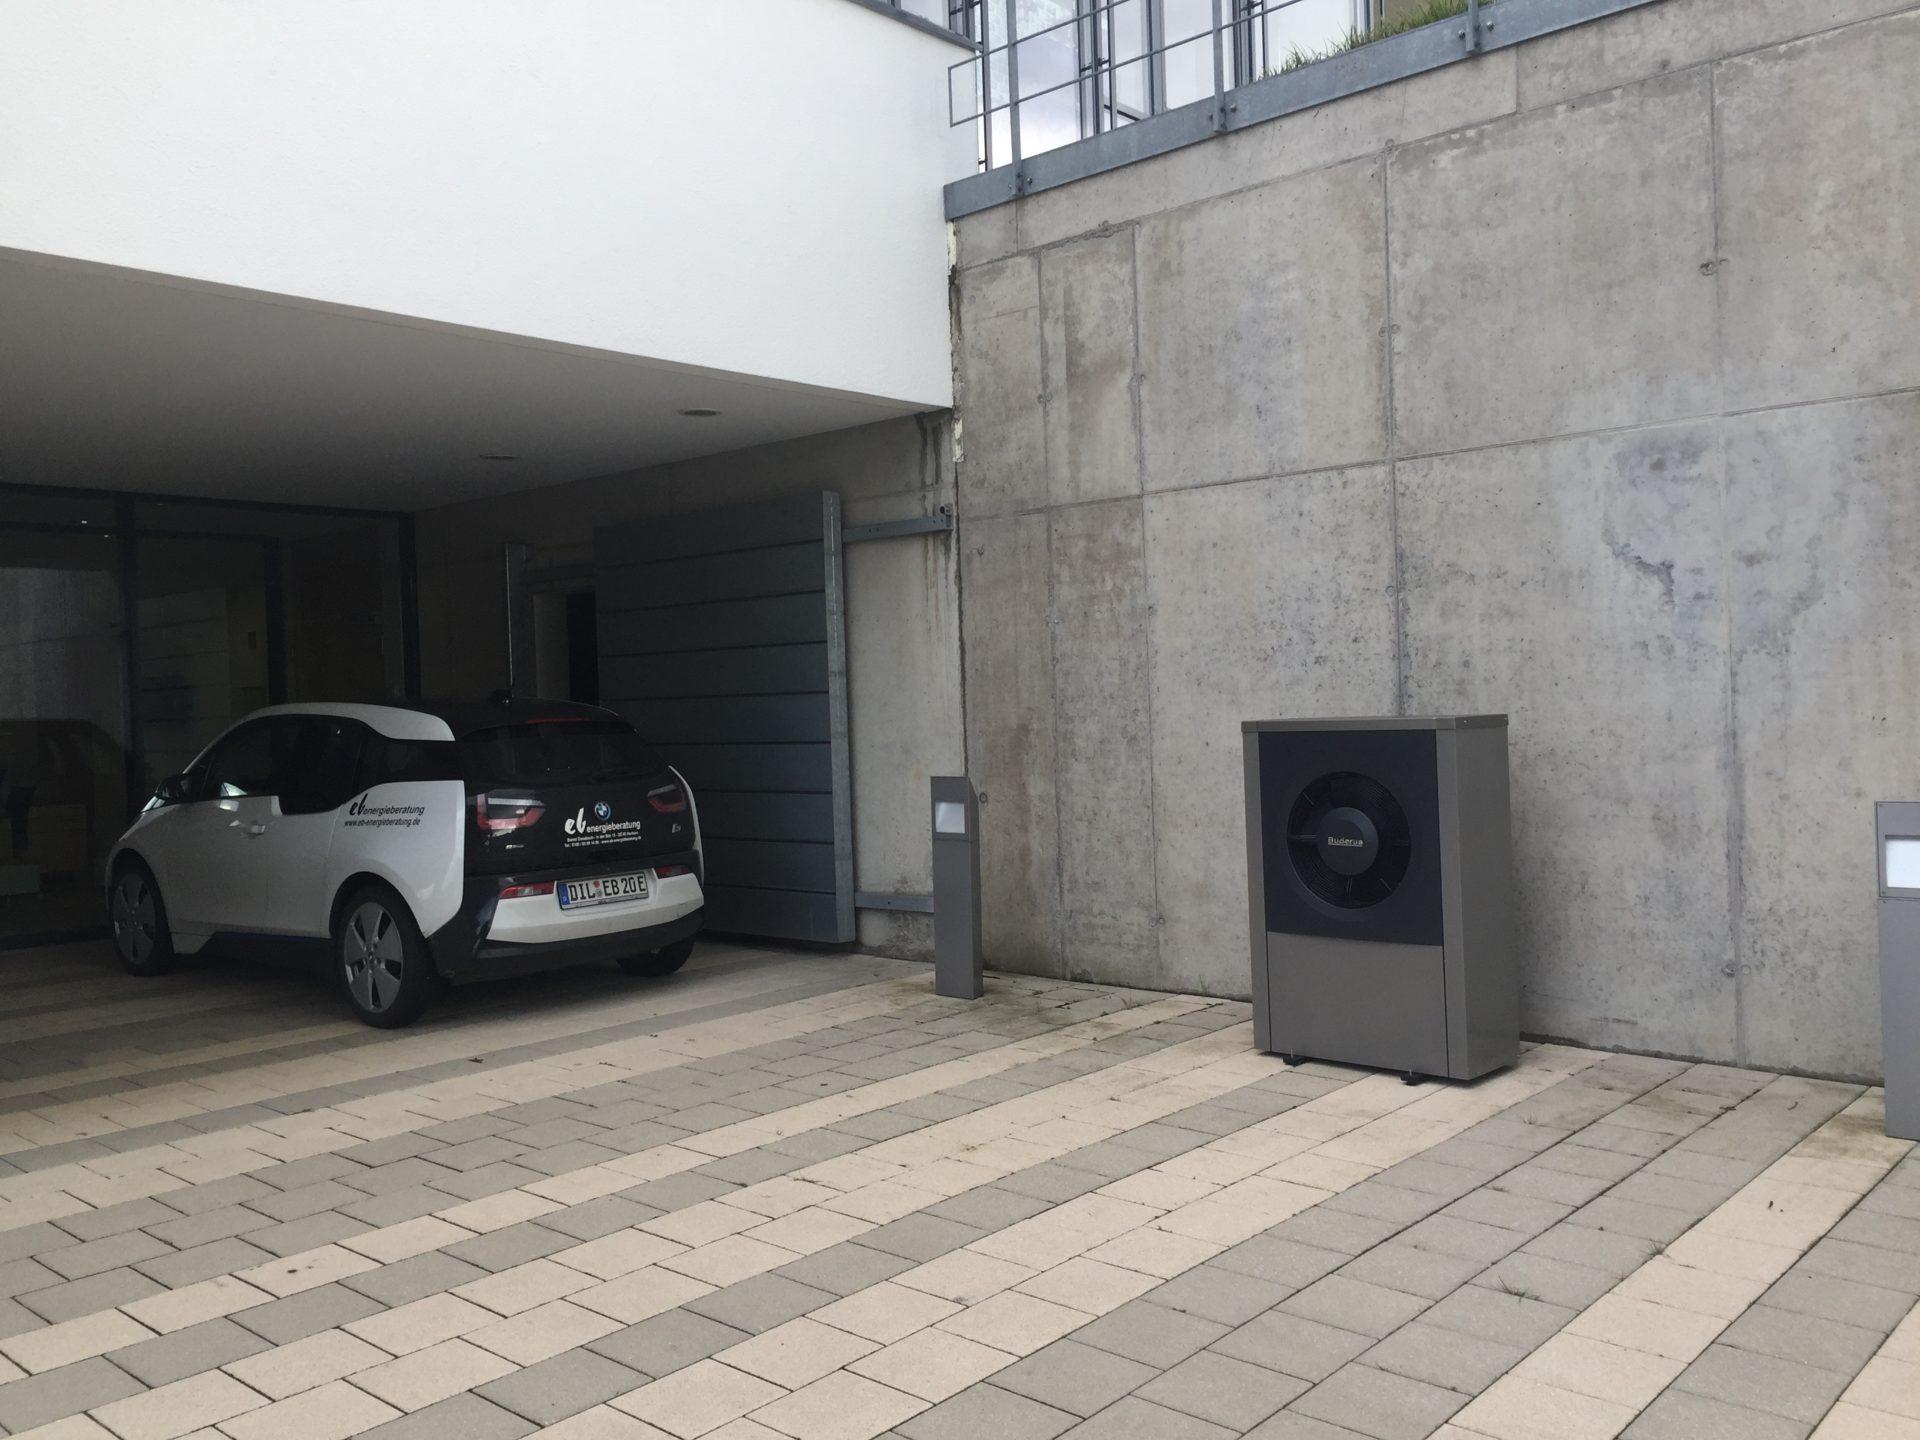 Wärmepumpe und Elektroauto